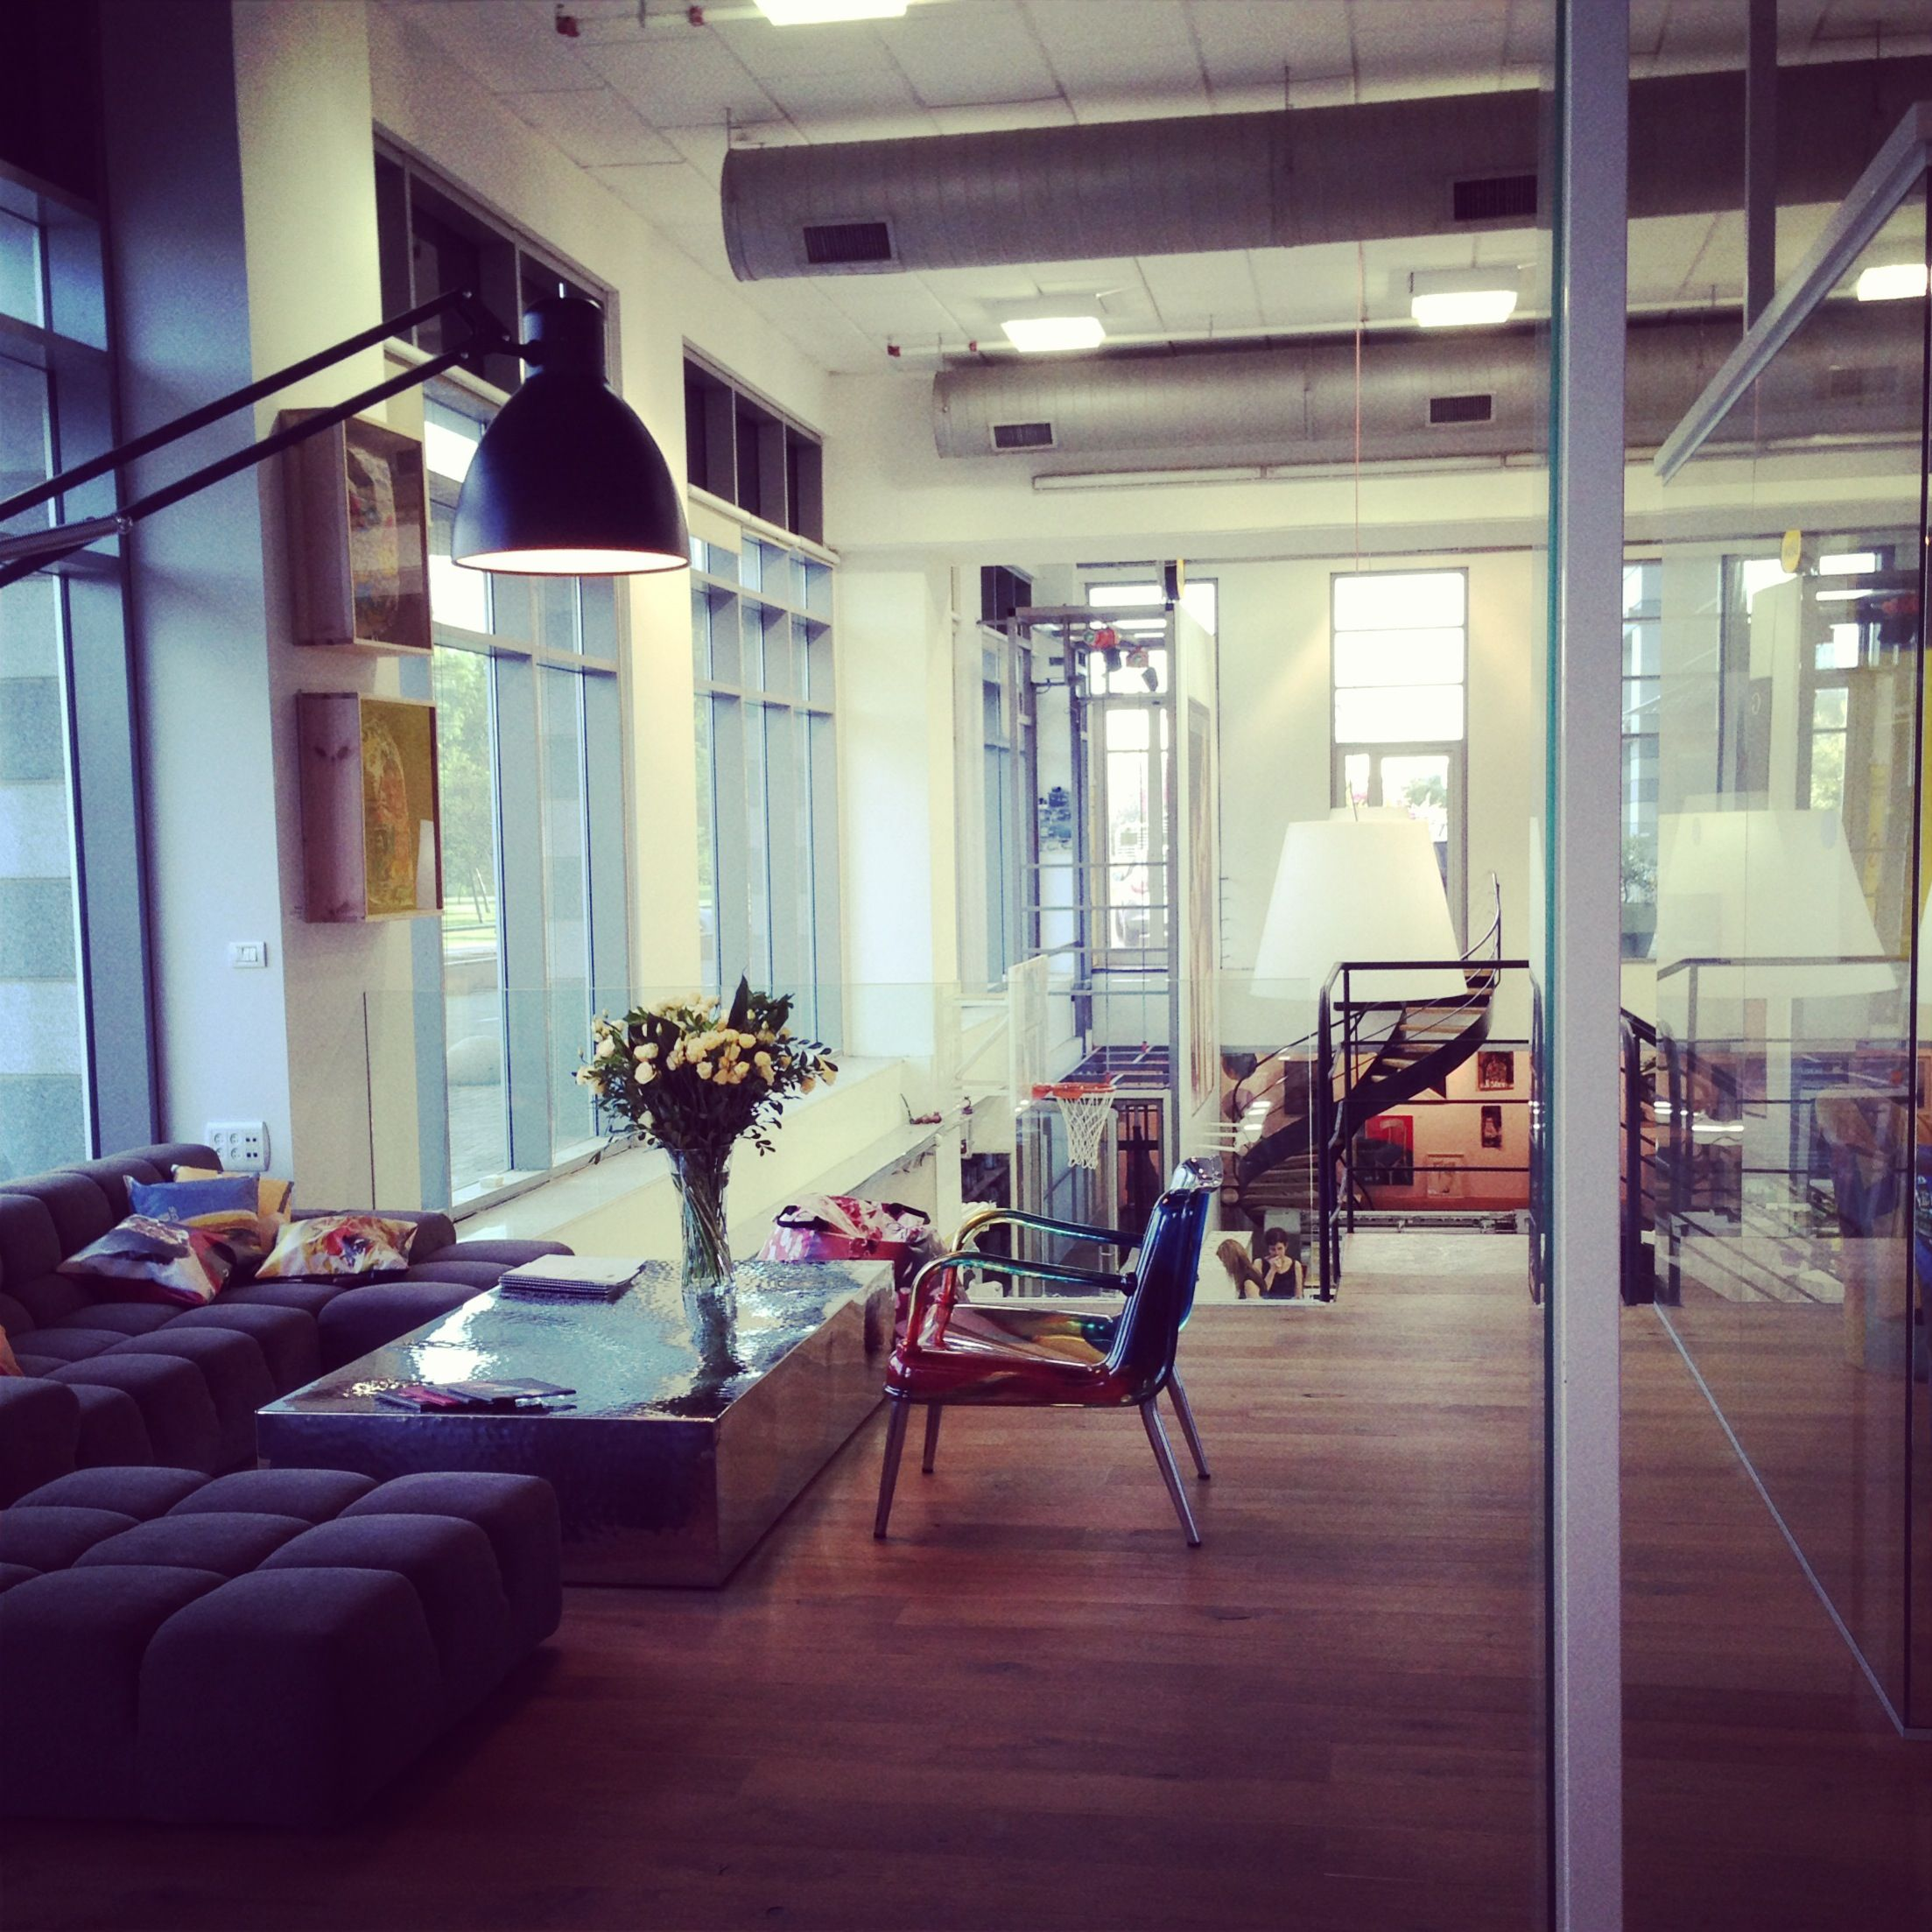 cool office spaces. Cool Office Space Spaces O